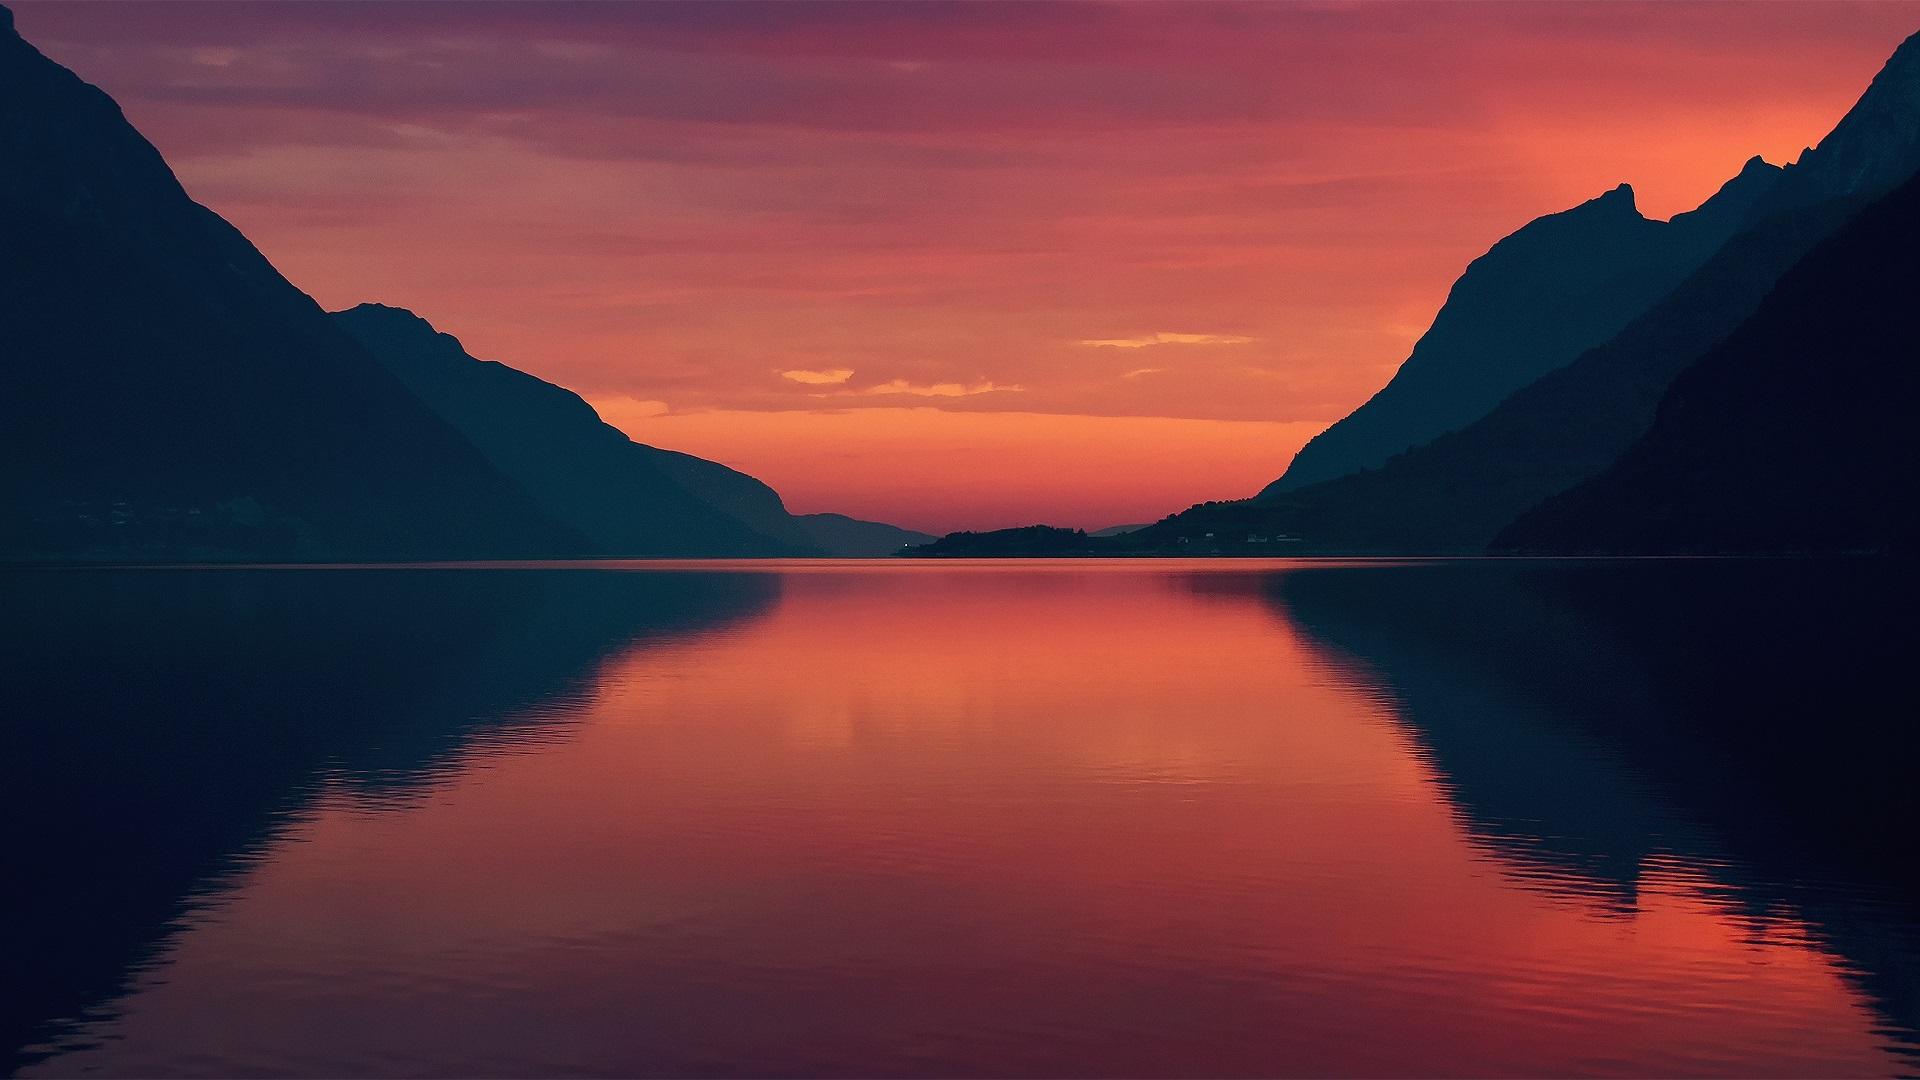 Wallpaper download morning - Norway Fjord Summer Morning Dawn Red Sky Wallpaper